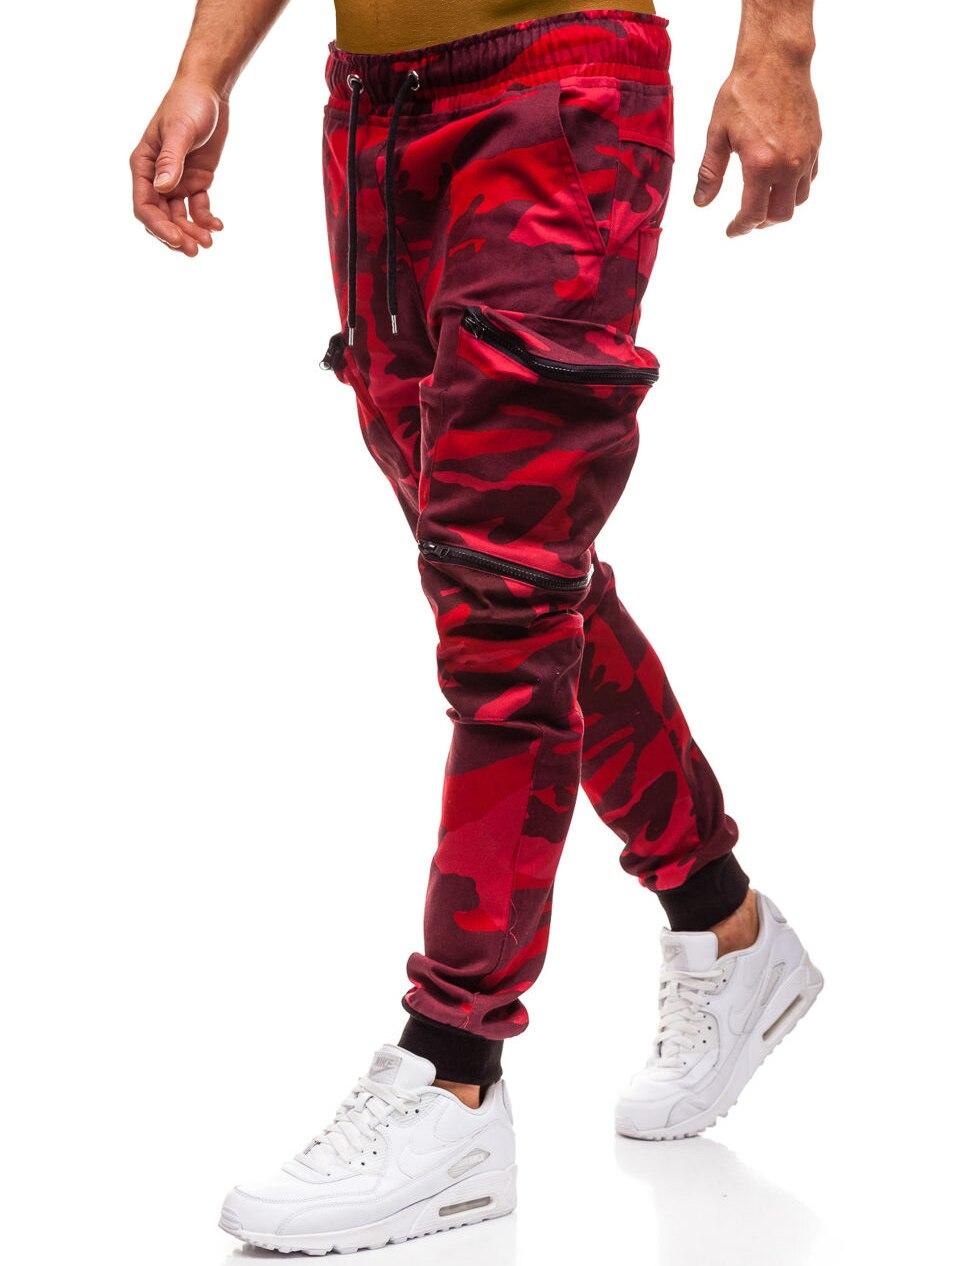 HTB1NqbiL3HqK1RjSZFgq6y7JXXa8 Mens Joggers 2019 New Red Camouflage Multi-Pockets Cargo Pants Men Cotton Harem Pants Hip Hop Trousers Streetwear XXXL